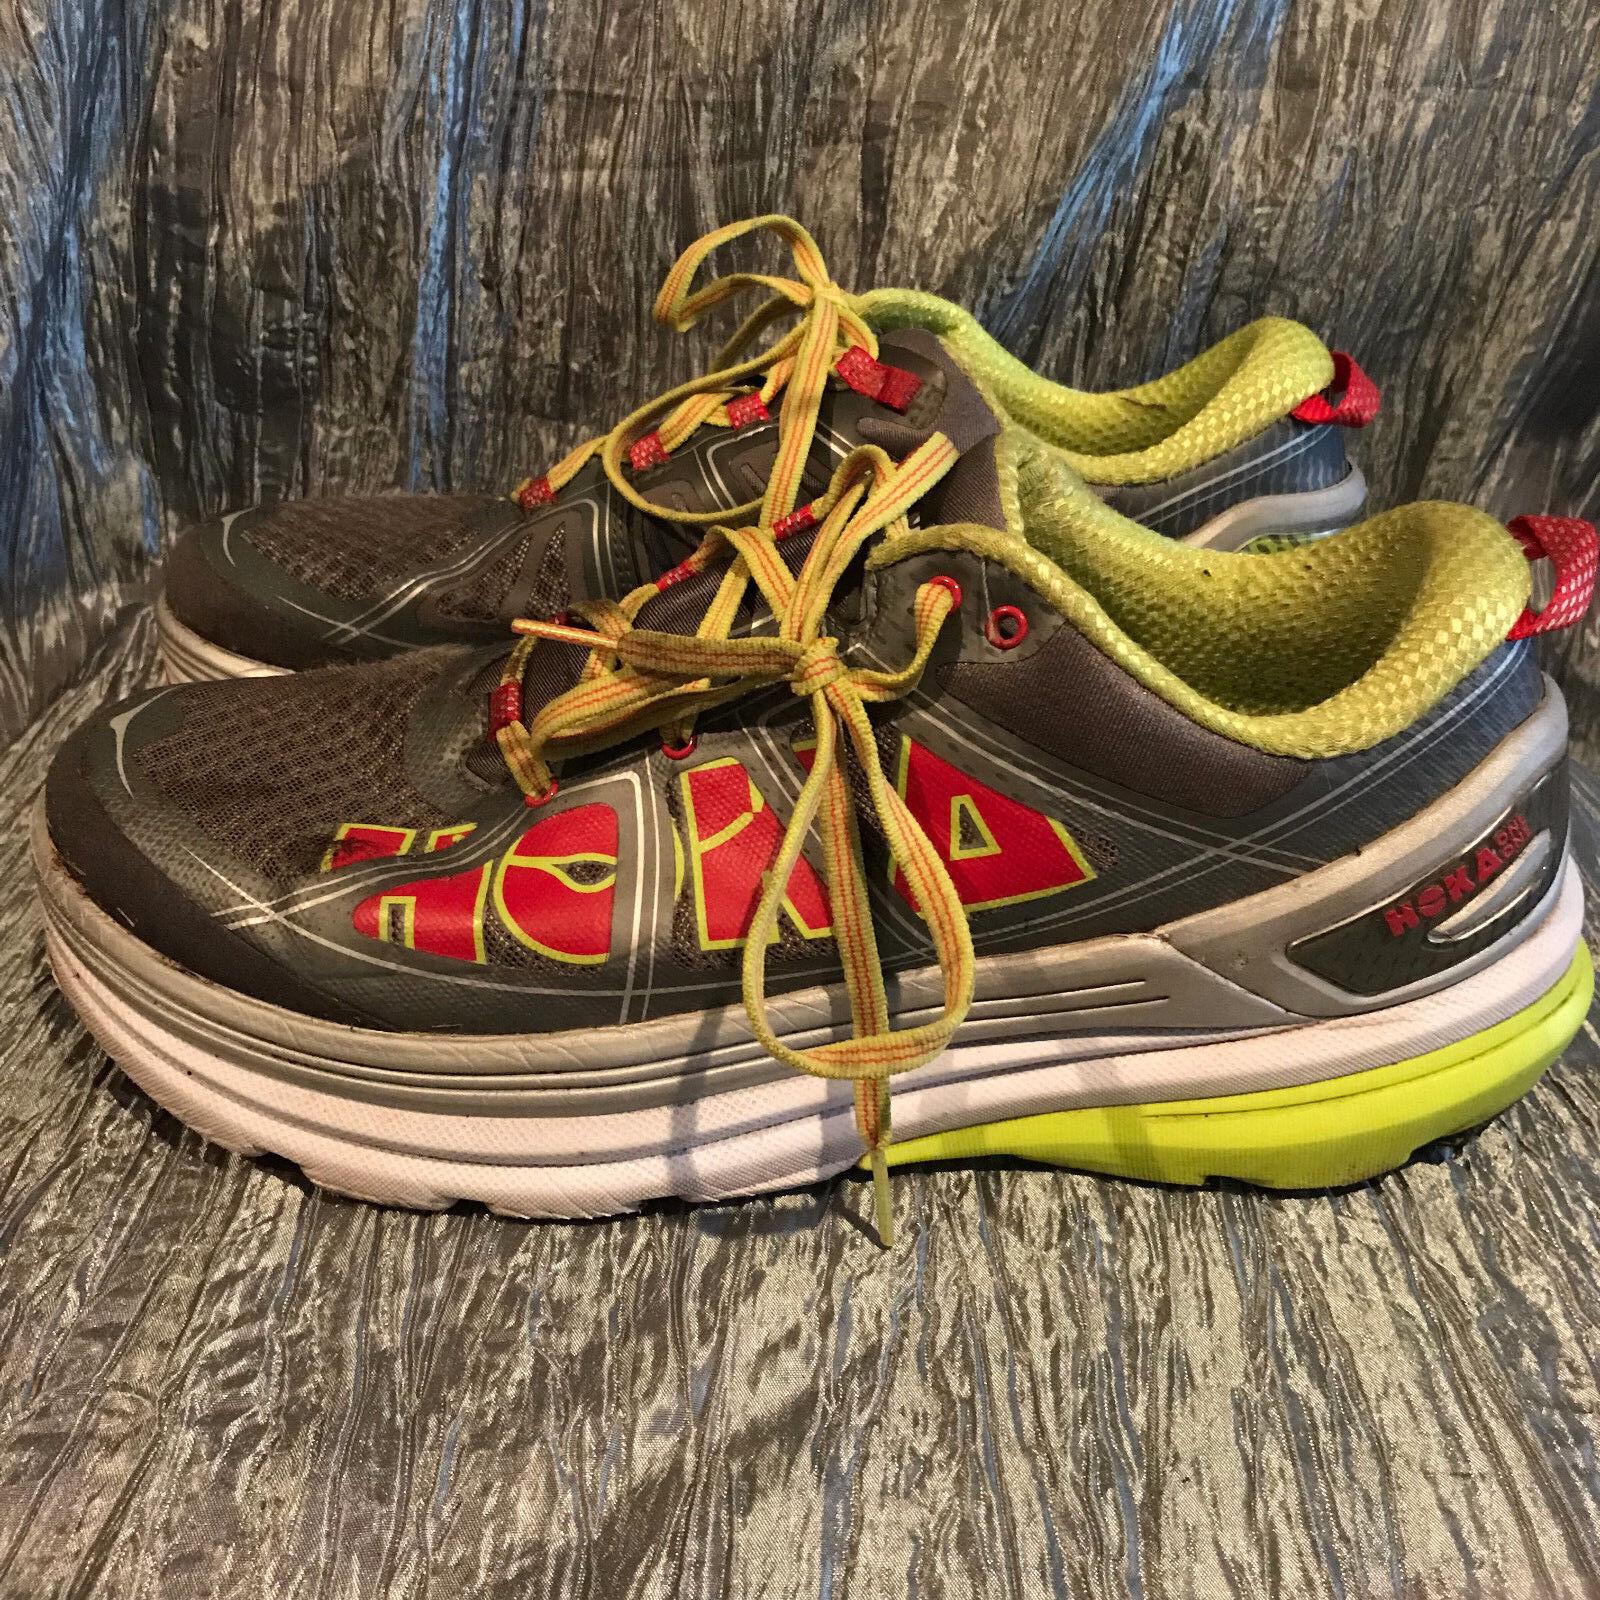 Women's Hoka One One Constant 2 Grey Acid 1009641 GAC Running Shoes 10.5